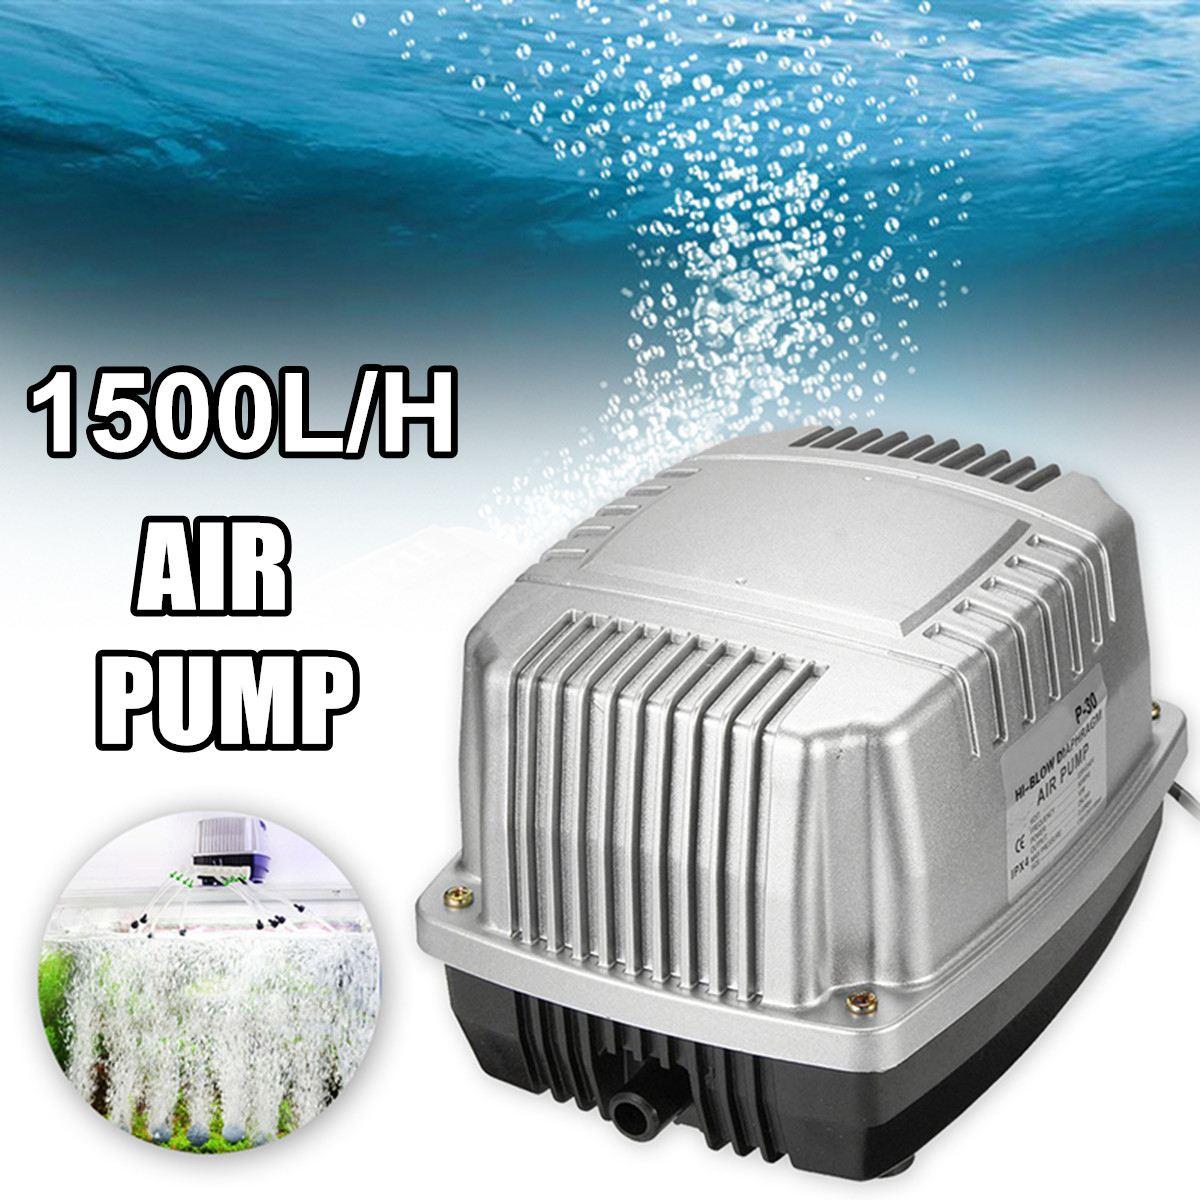 10 W haute puissance compresseur d'air ferme grand Volume ABS pompe à Air muet silencieux Machine à oxygène rinçage à l'oxygène Aquarium pompe à Air 25 L/min